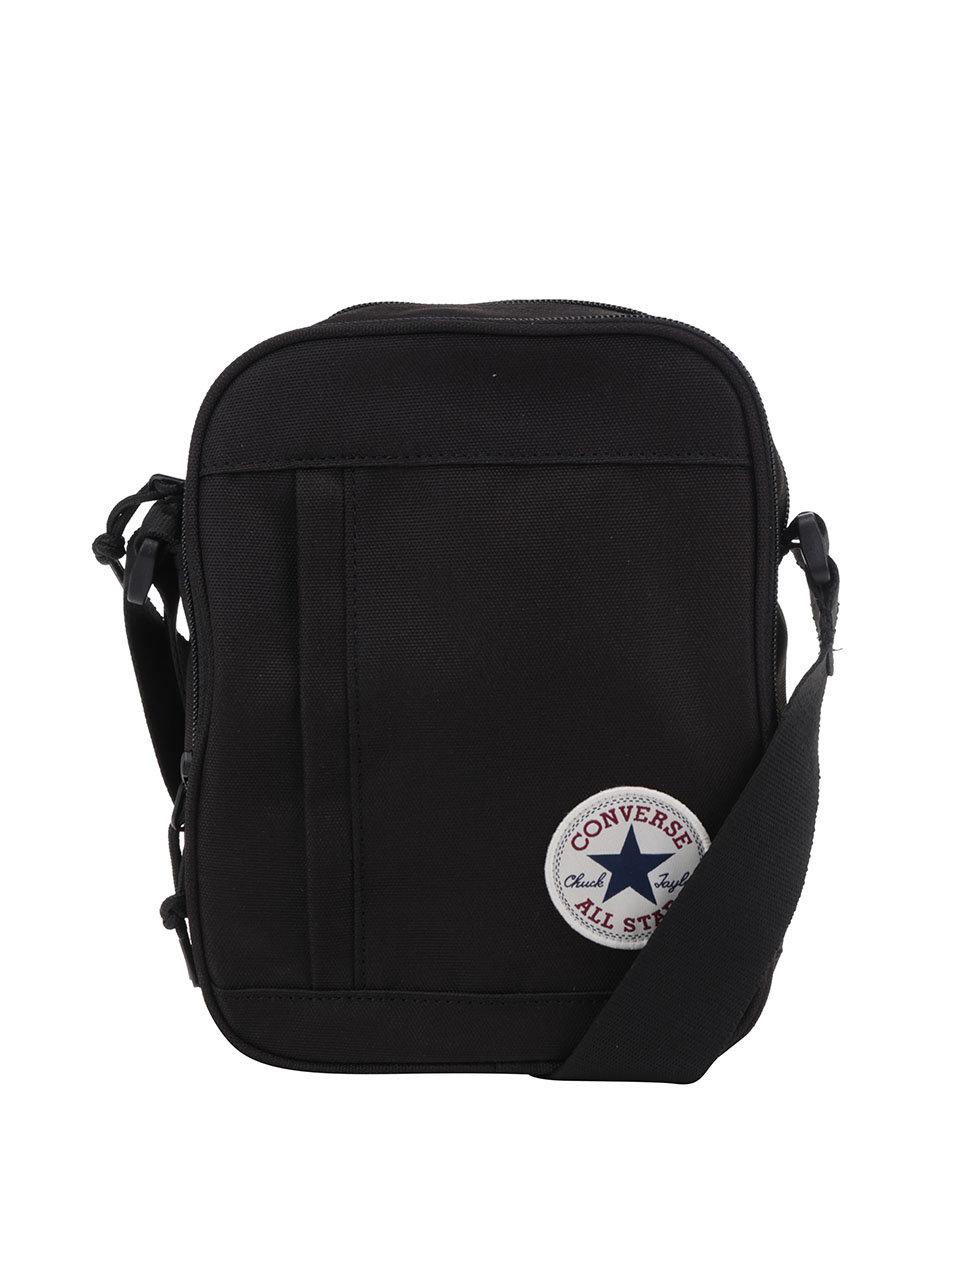 3d761a9c93666 Čierna unisex taška cez rameno Converse Poly | ZOOT.sk